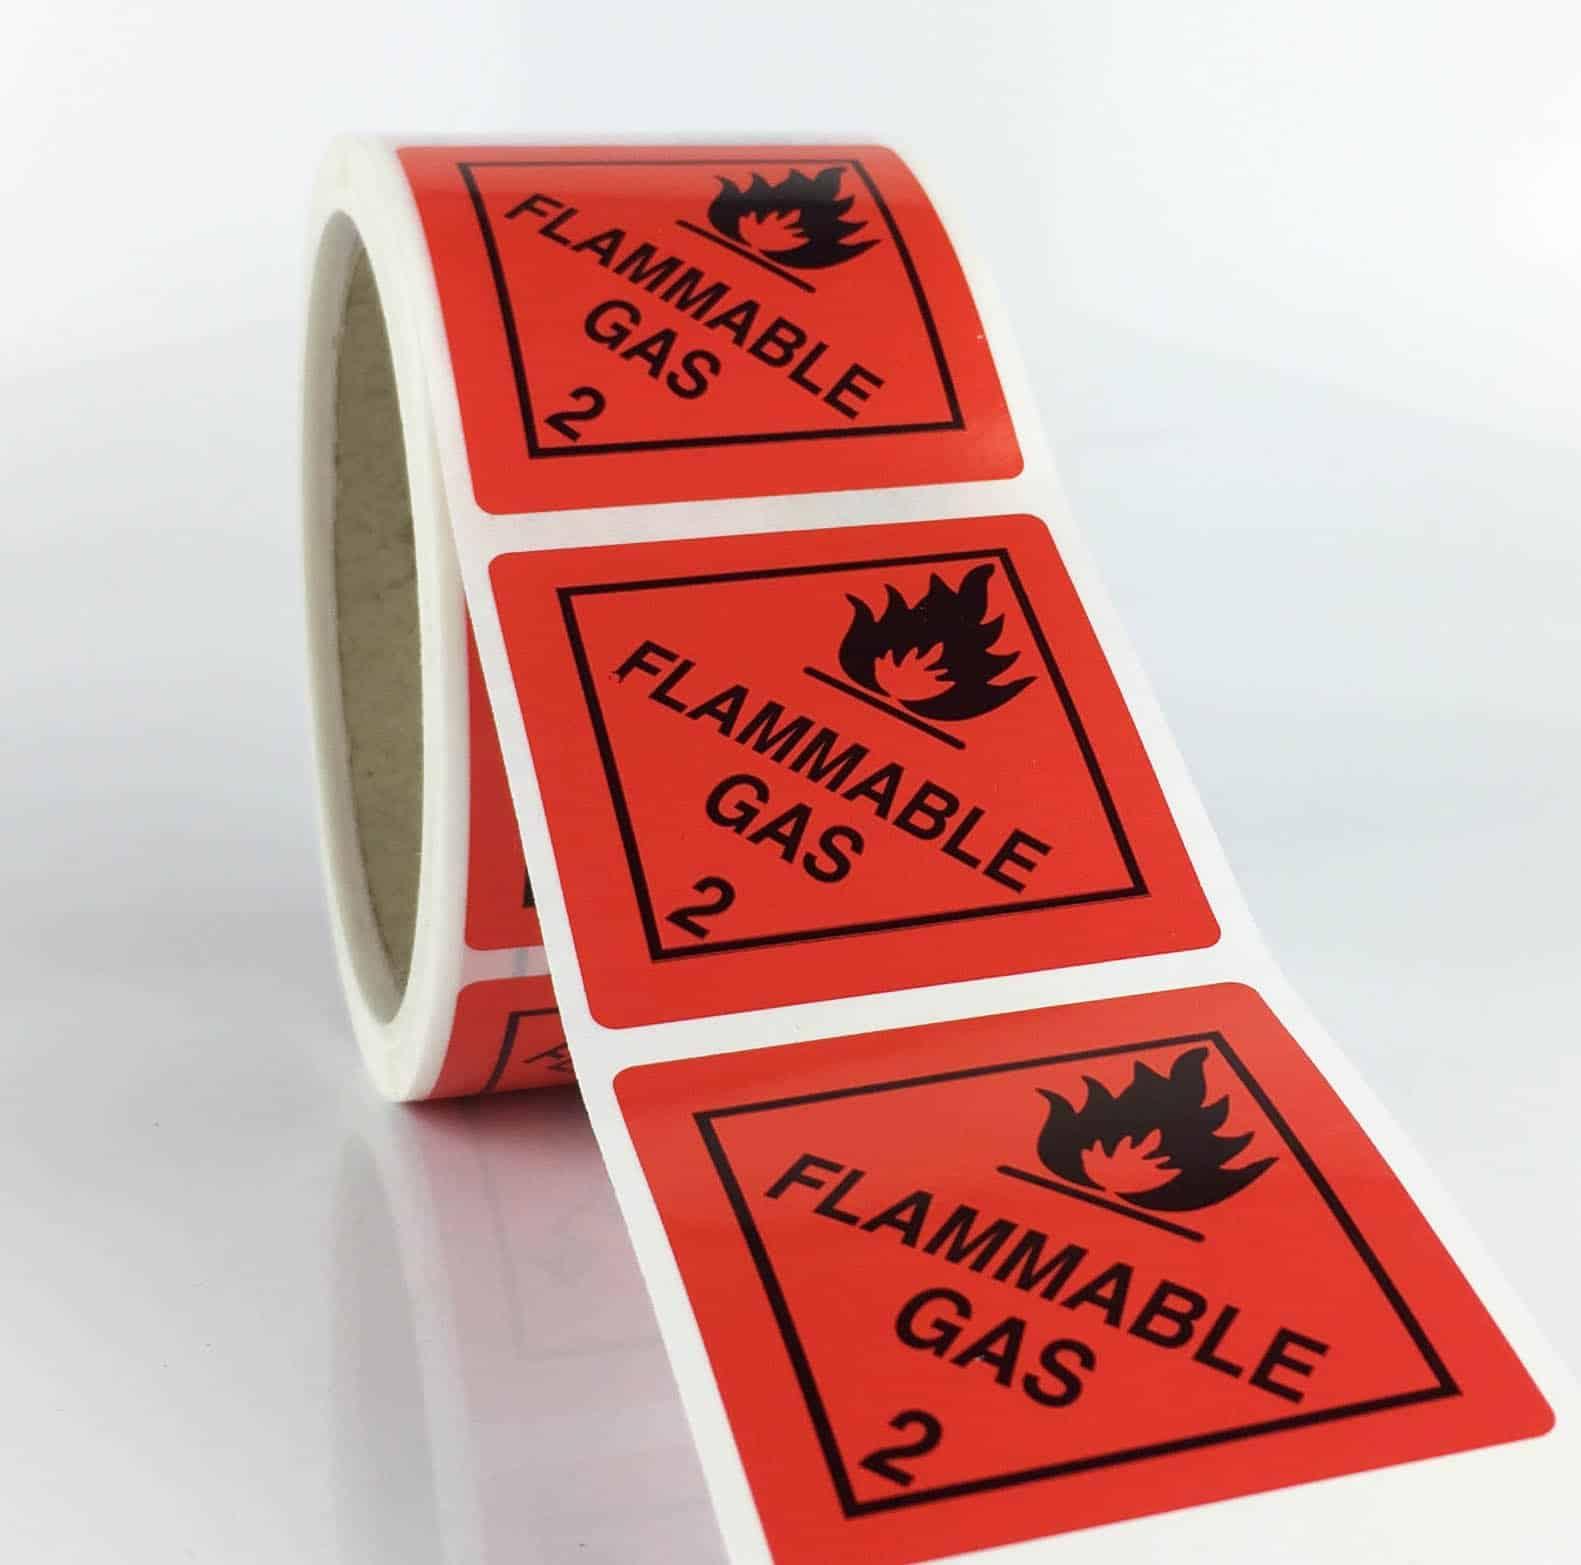 Class 2.1 Labels. Flammable Gas (Rolls) 50mm X 50mm